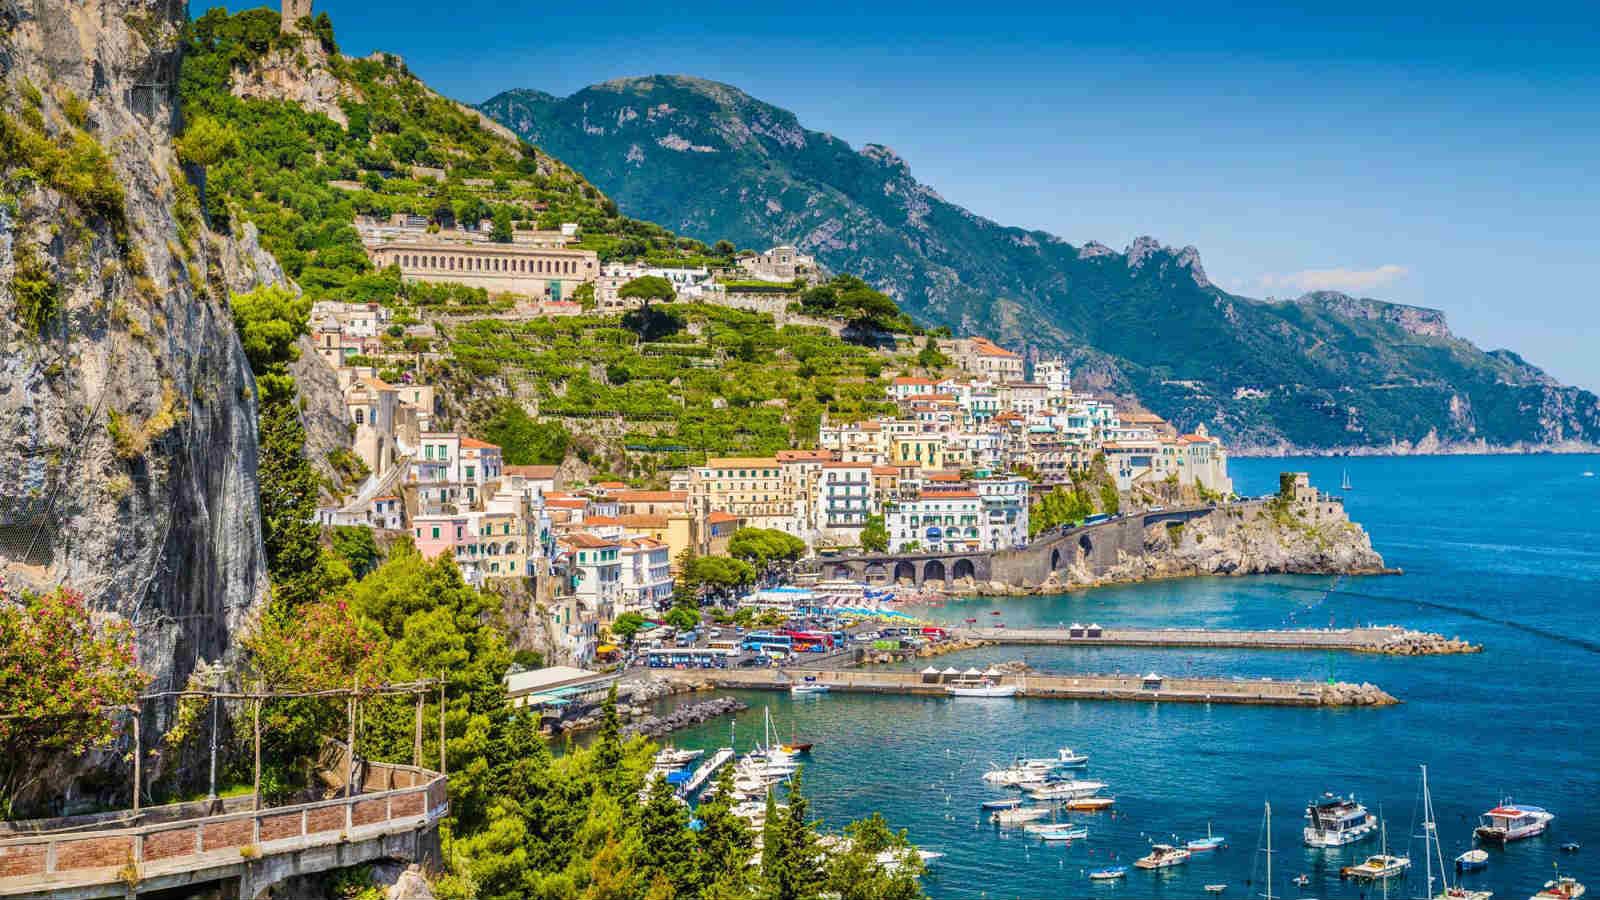 Brand new 4* Hotel on the Exclusive Sorrento Coast